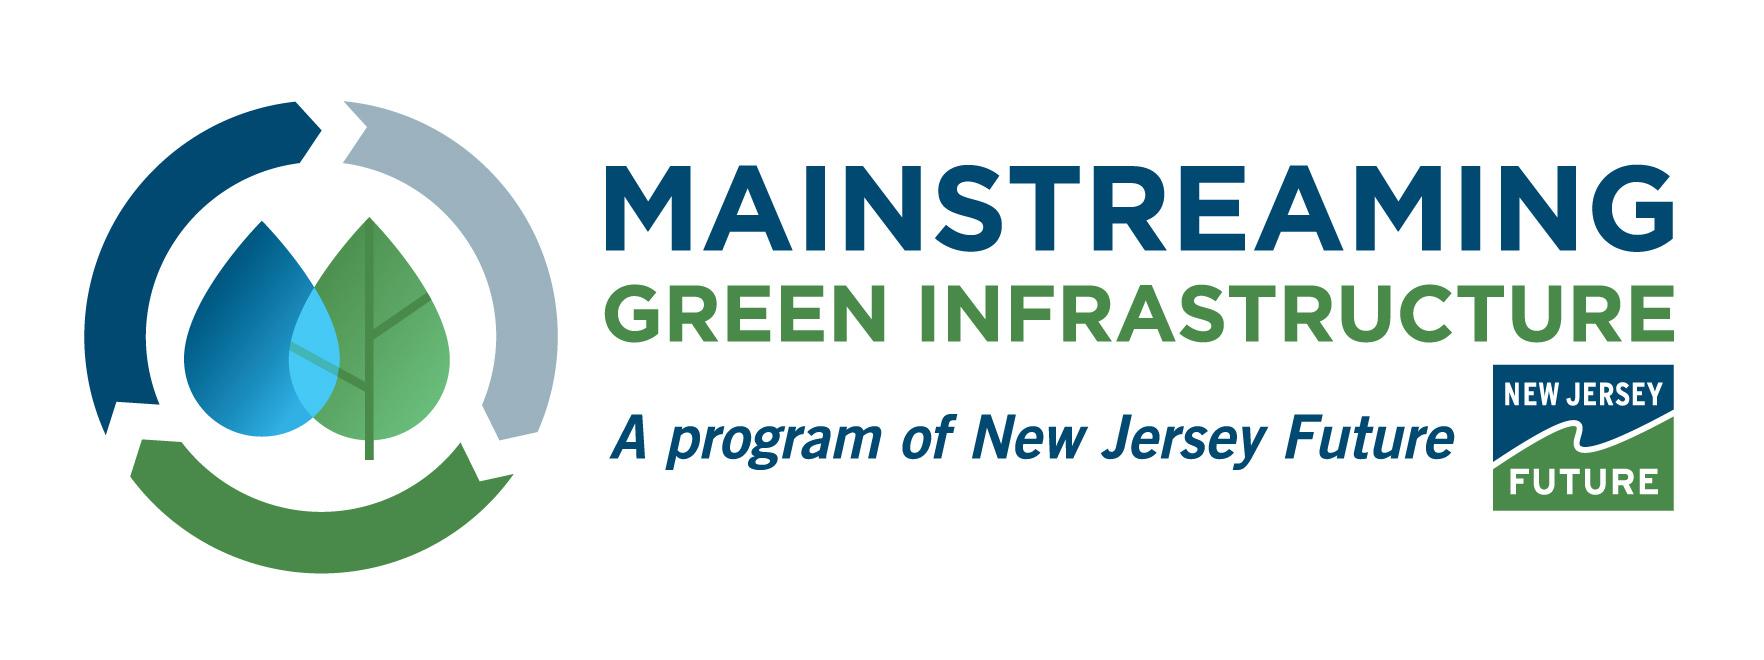 Mainstreaming Green Infrastructure program logo